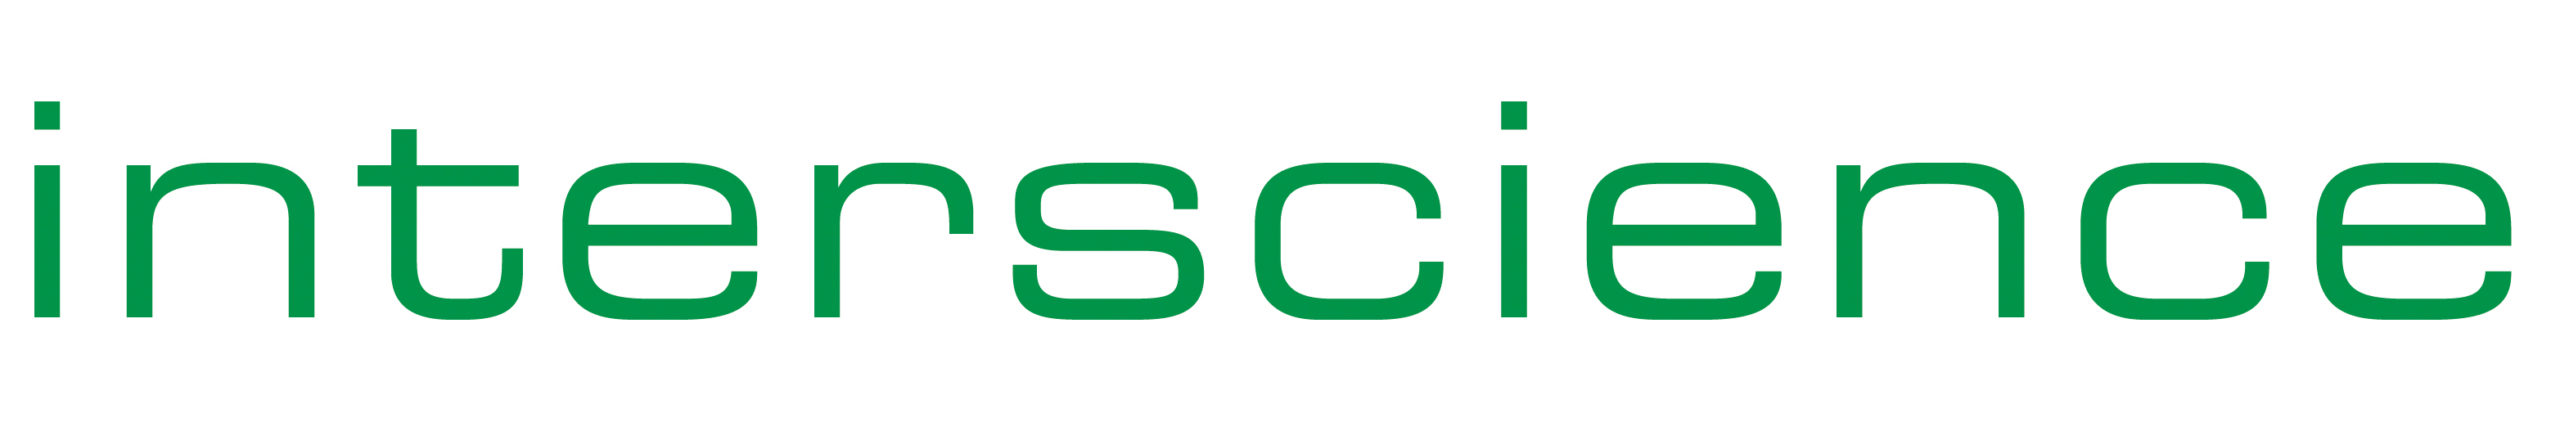 interscience-logo-RGB-300ppp